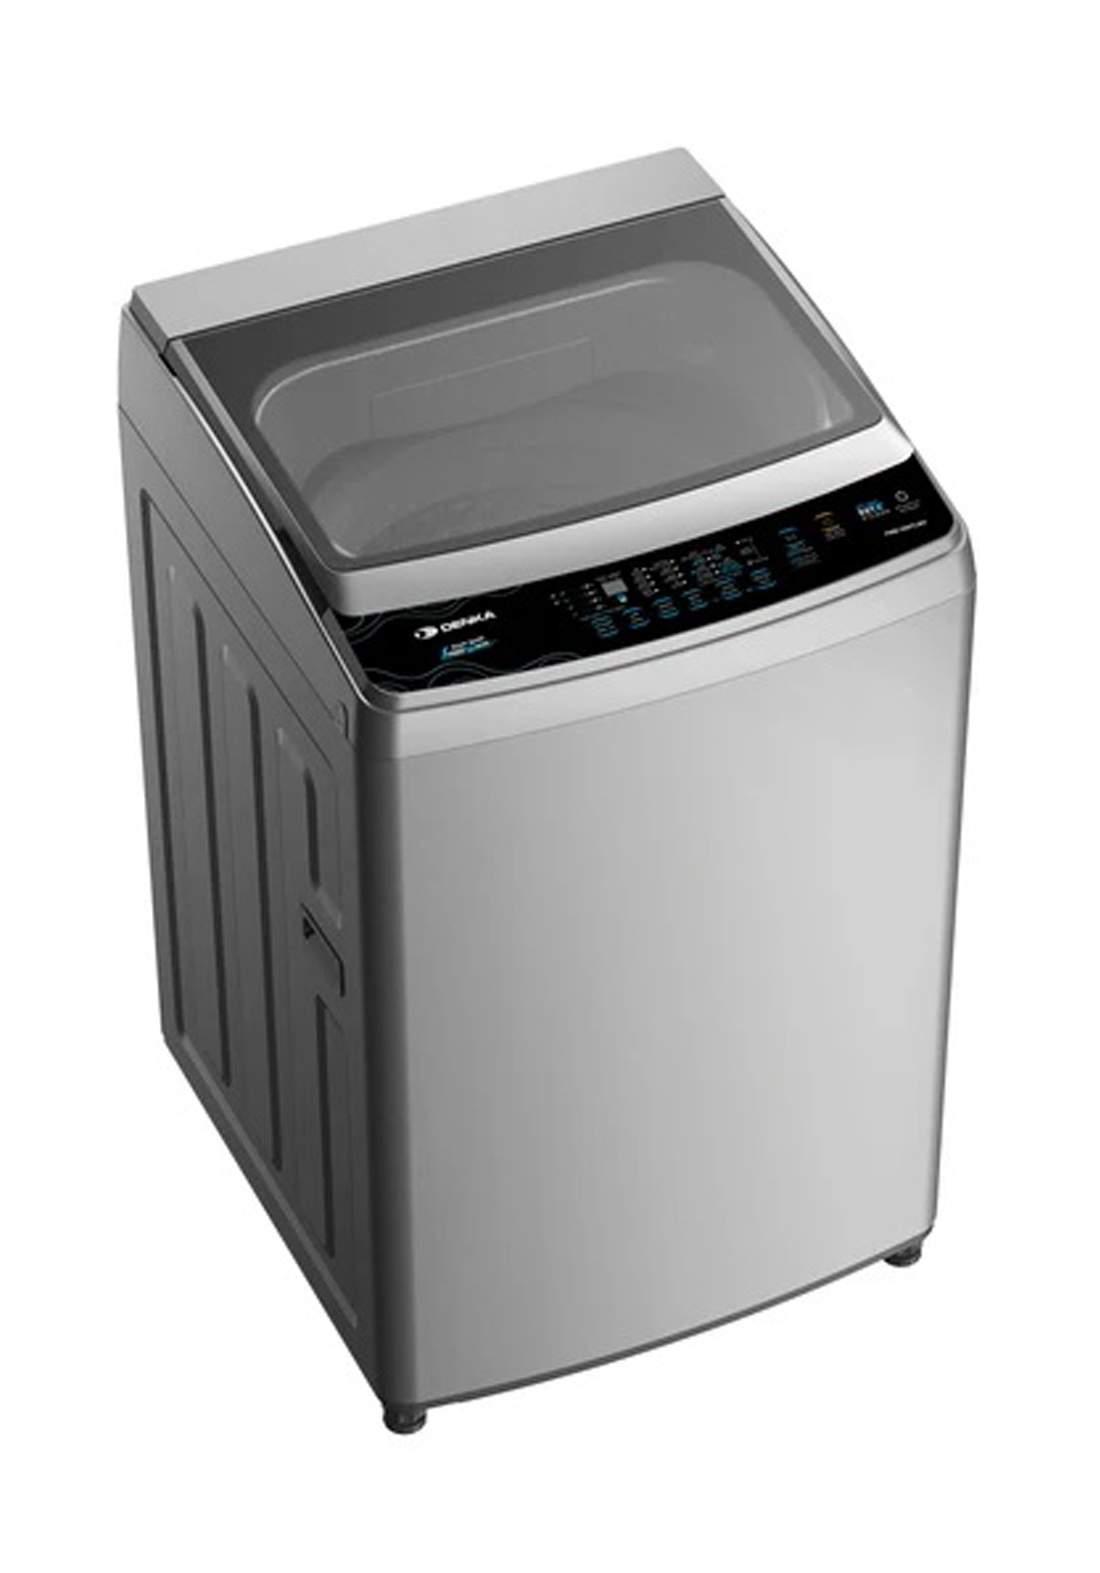 DENKA FWM-1500TLSL washing machine 15kg  غسالة ملابس